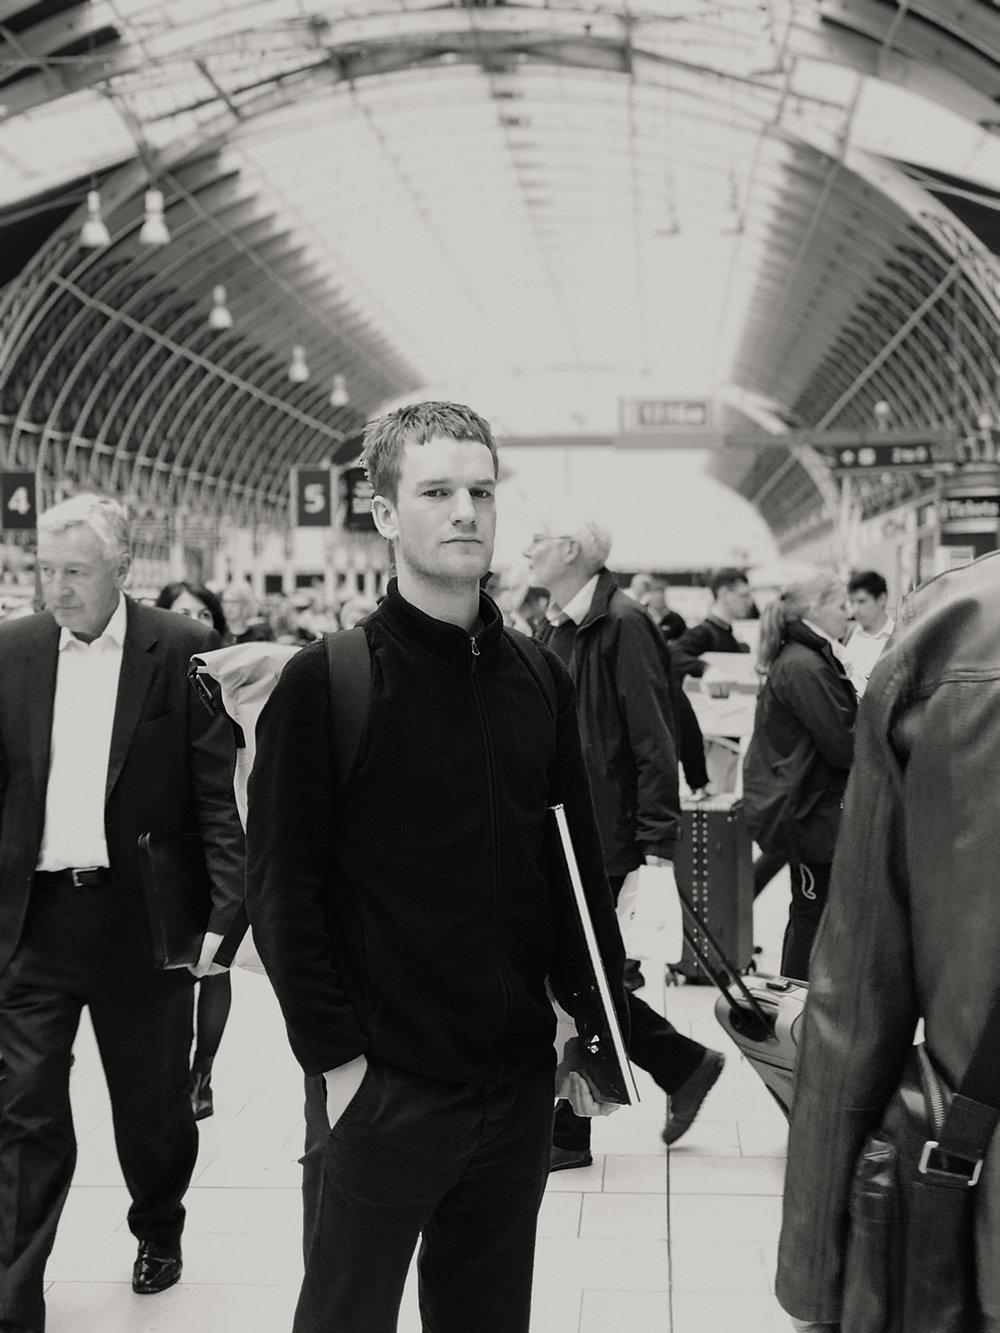 Calum Heath - Paddington Station, London,3rd May 2018